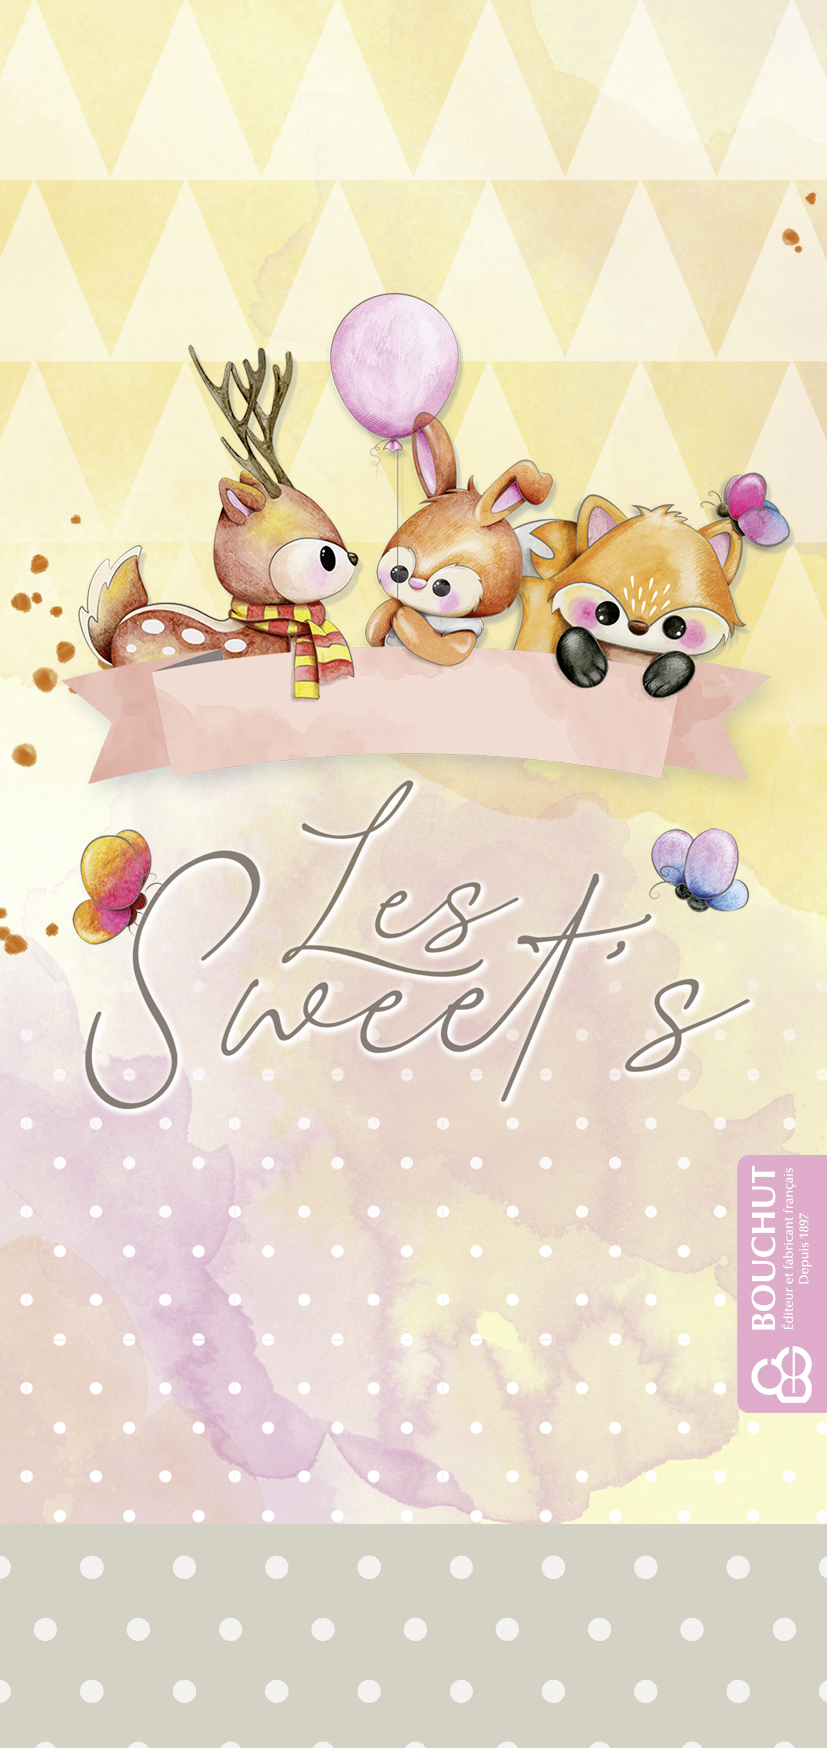 Fond d'écran smartphone Sweet's Animal